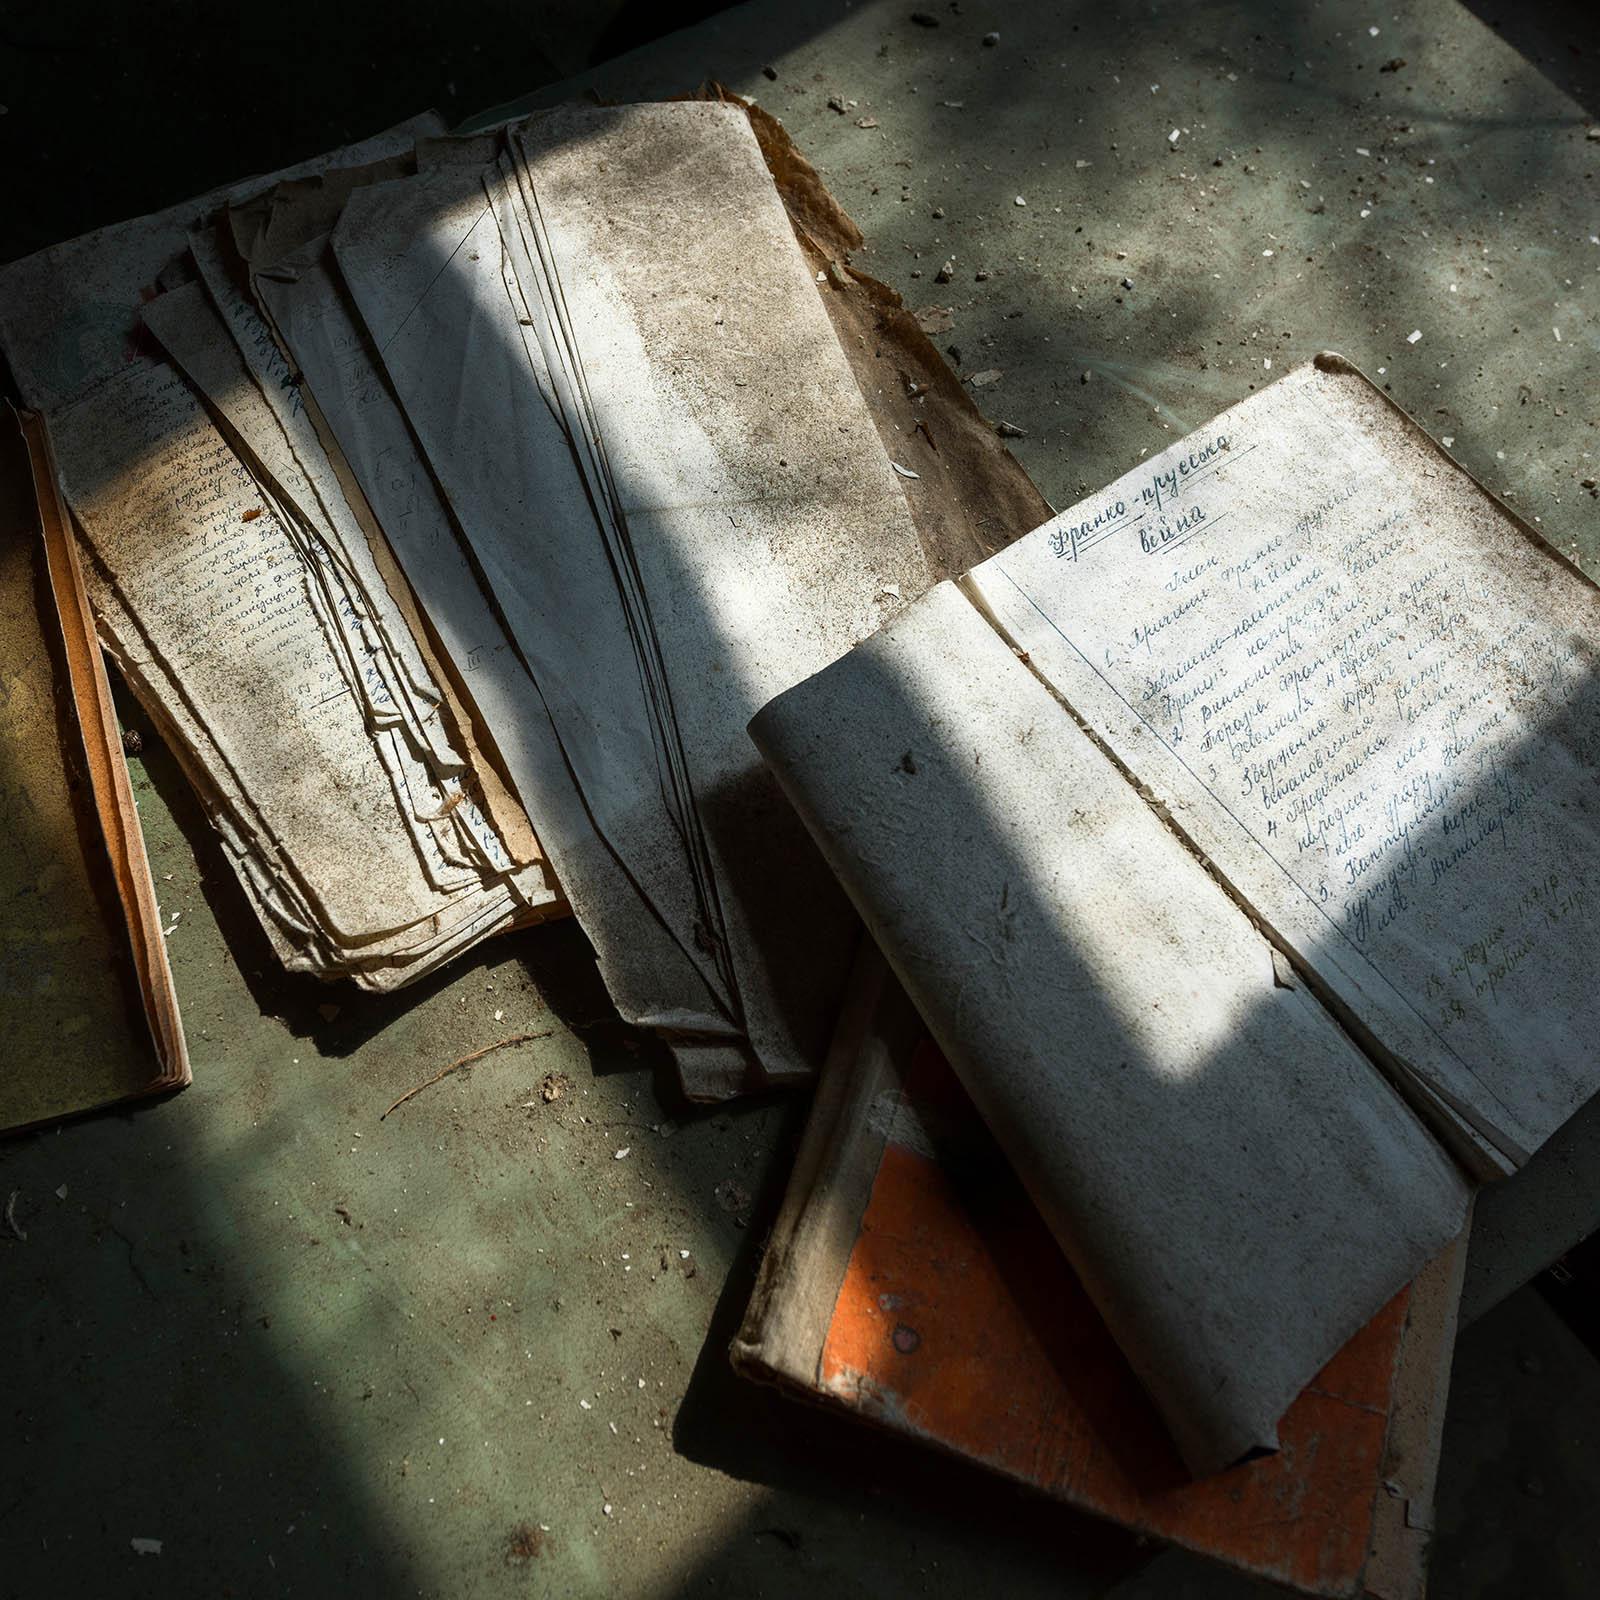 Discarded school books Chernobyl